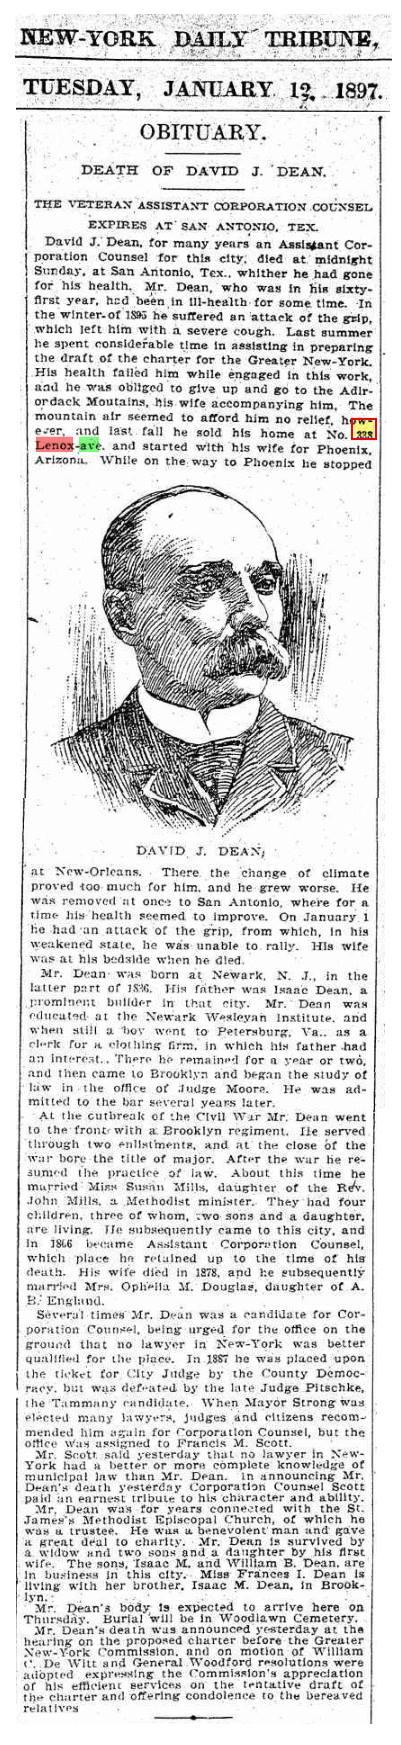 David J Dean Obituary, 1897